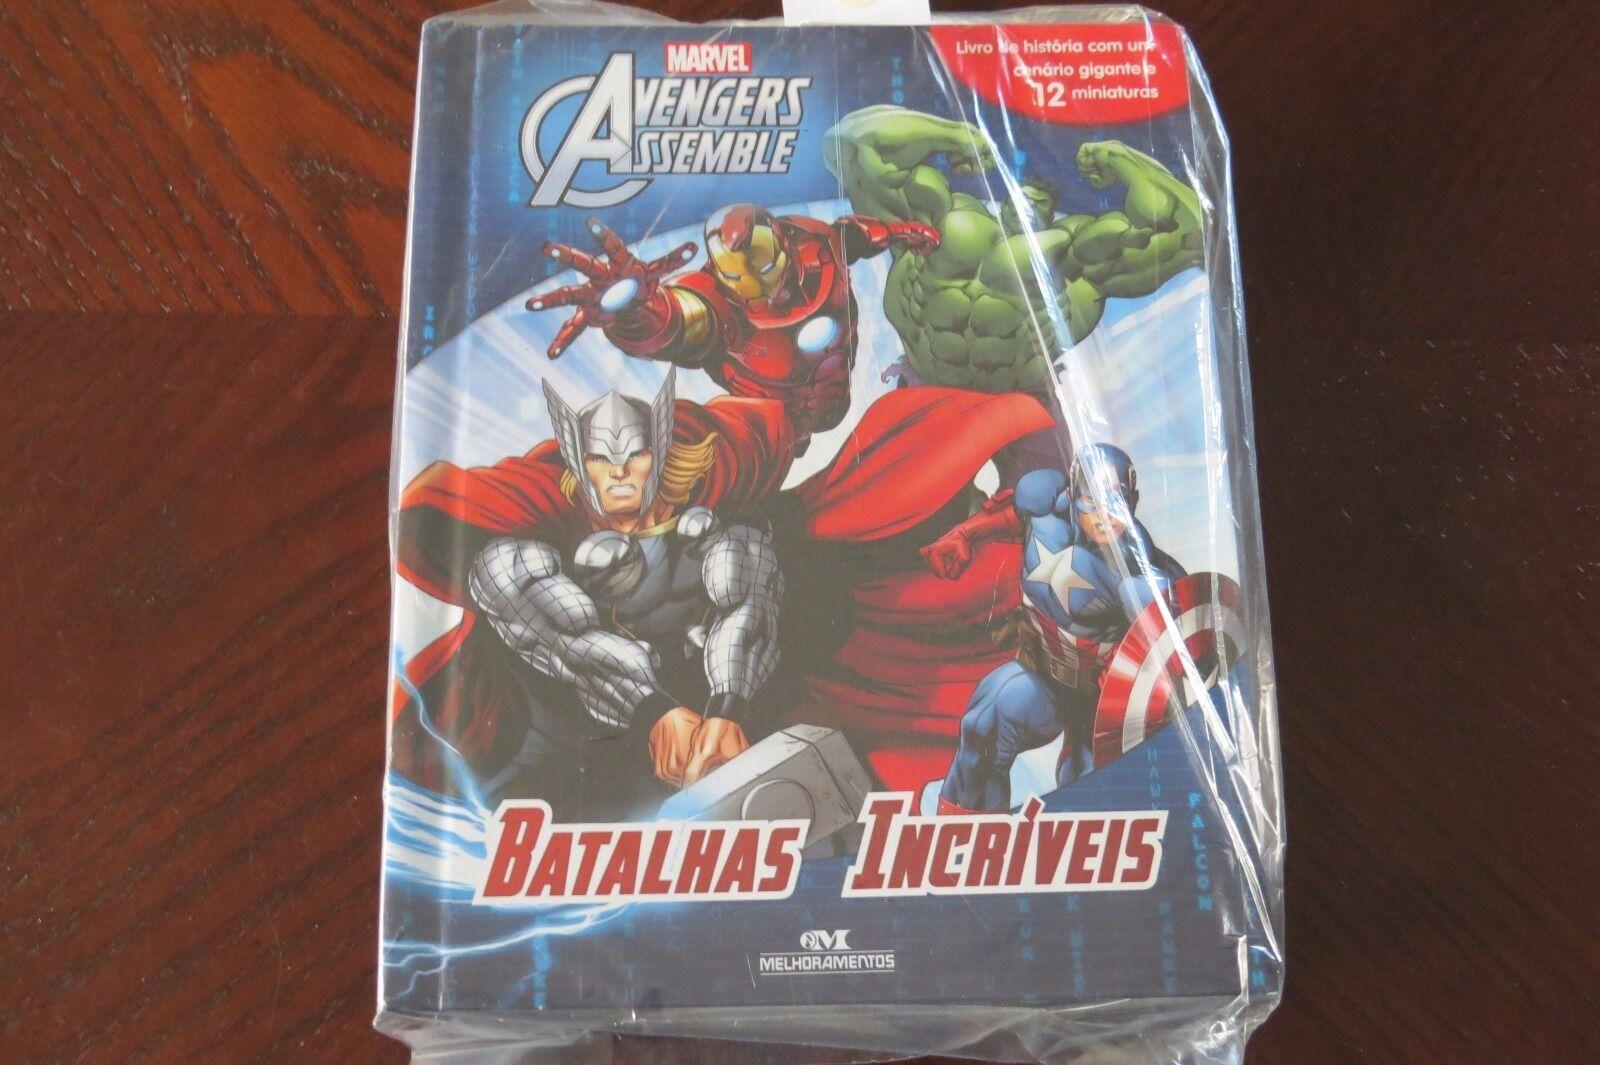 Marvel Avengers Assemble Batalhas Incriveis (Em Portuguese do Brasil)